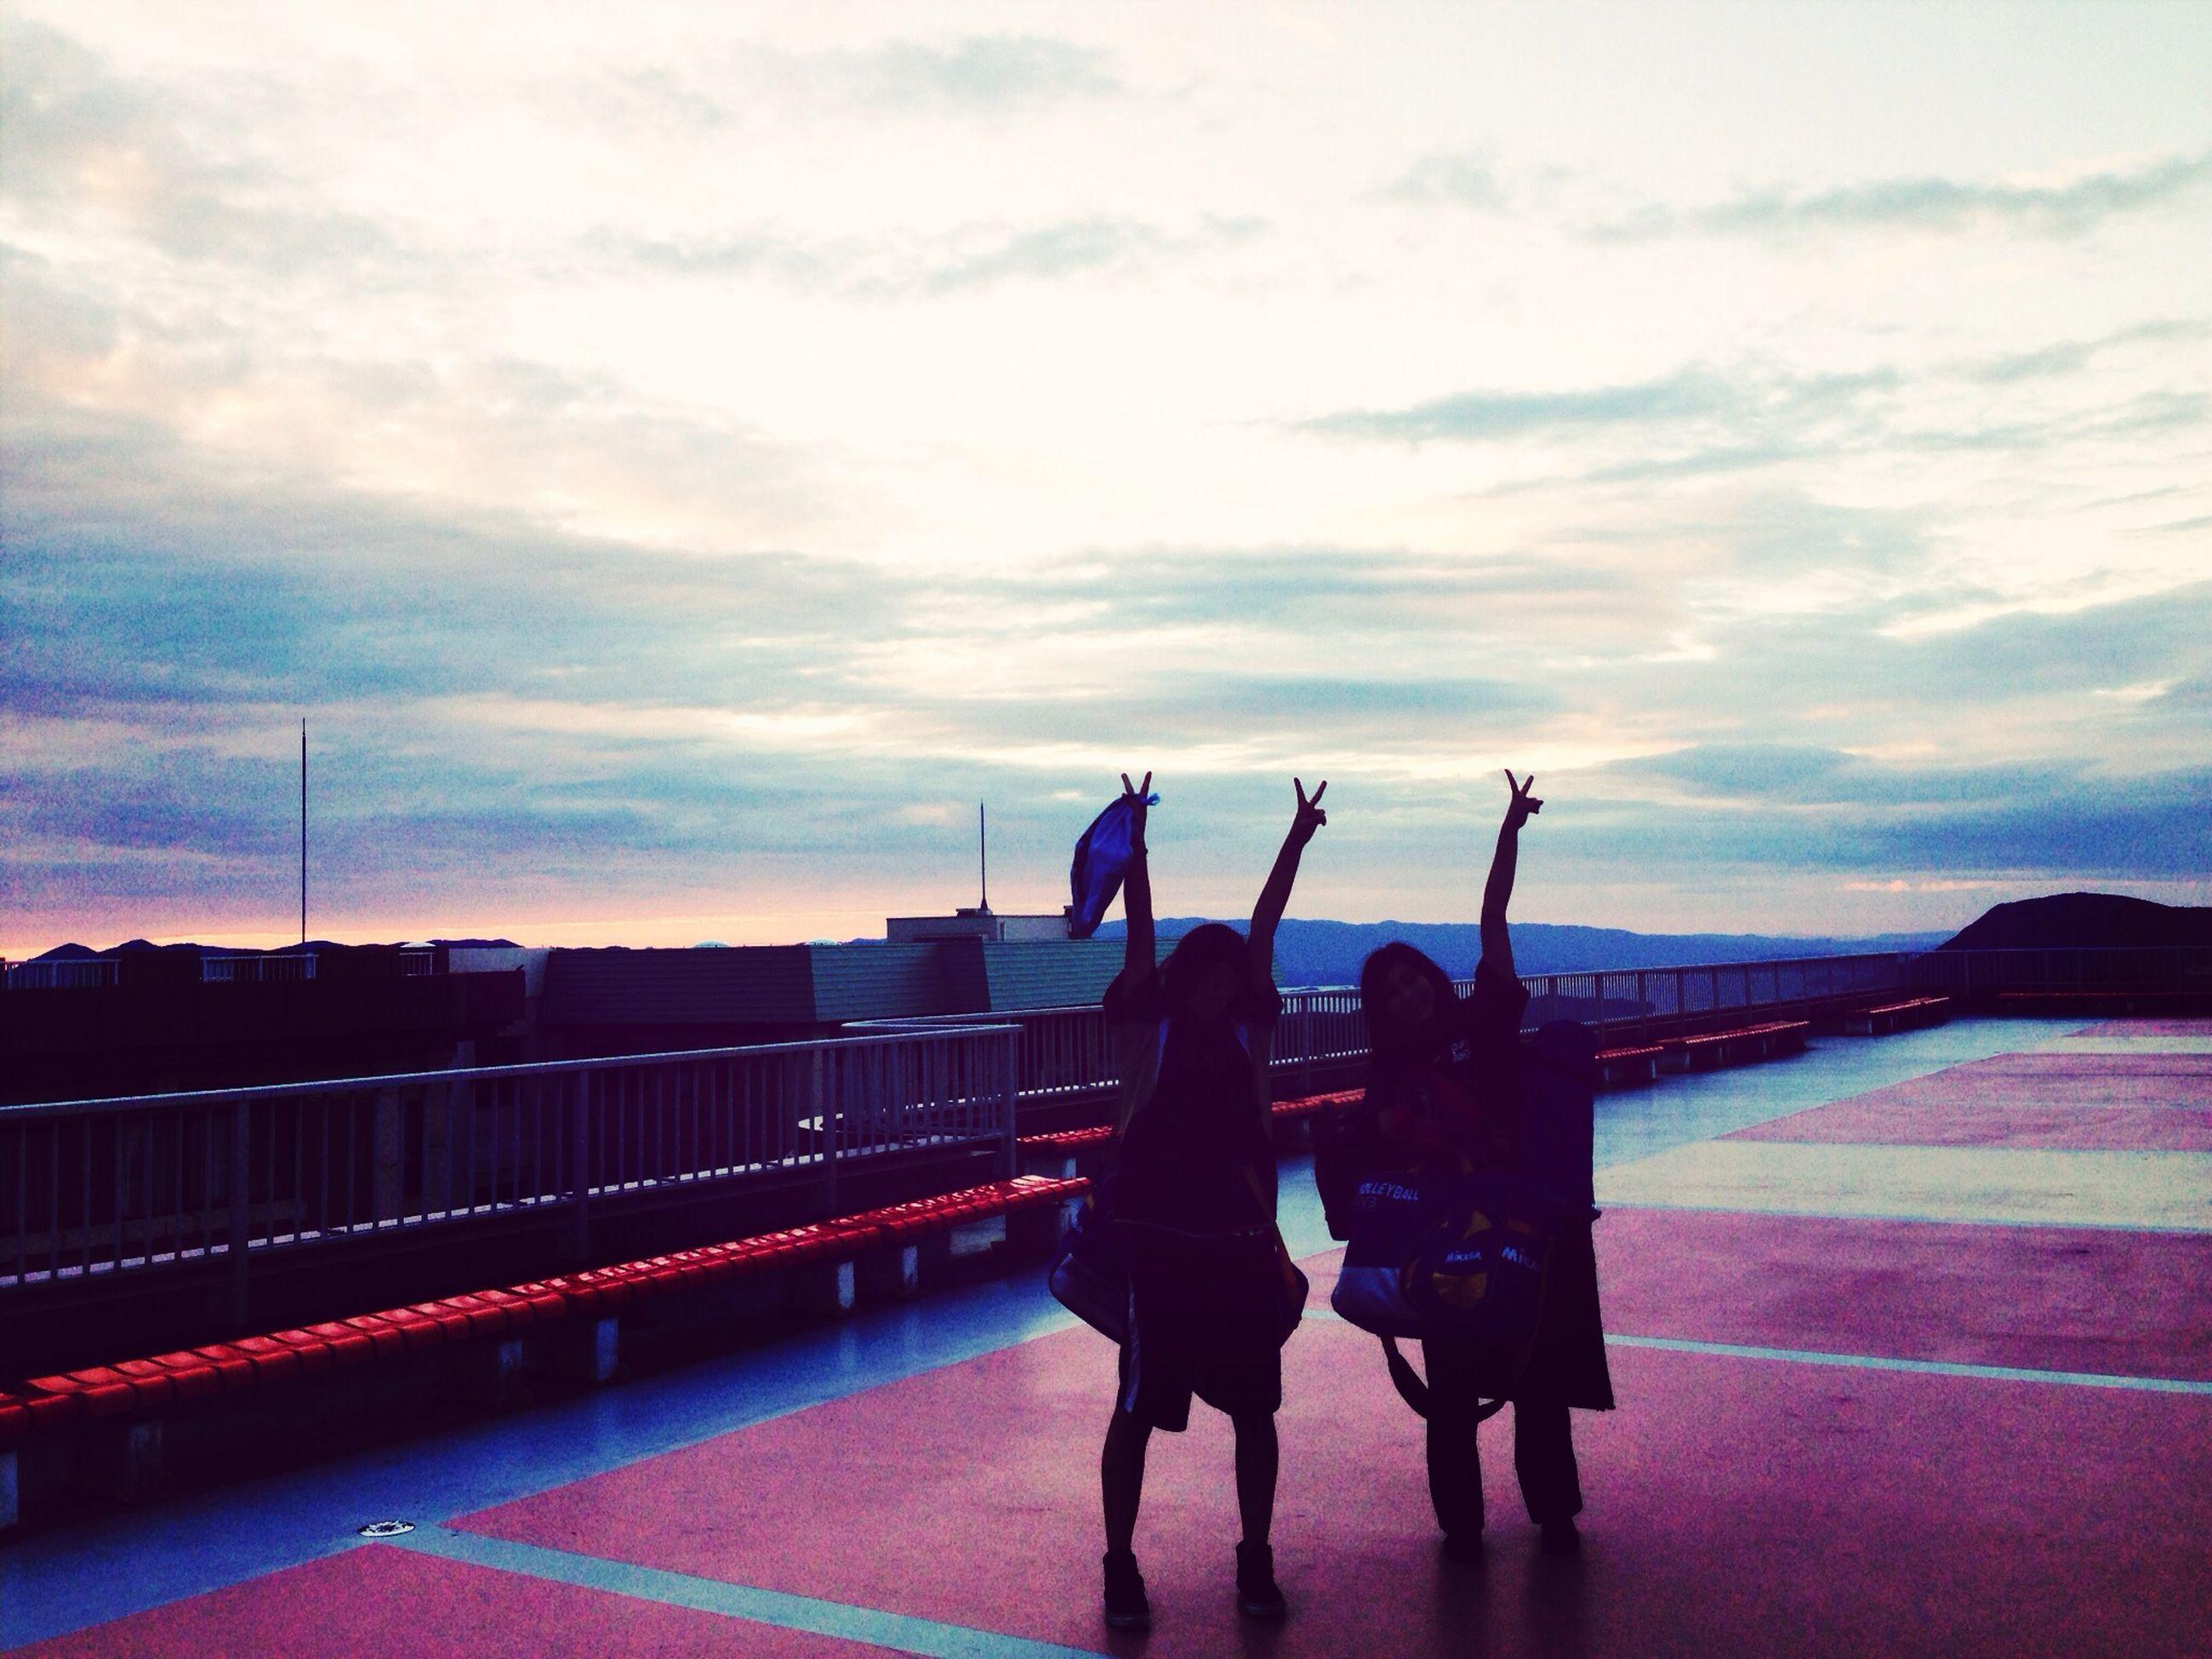 men, sky, lifestyles, leisure activity, person, transportation, cloud - sky, silhouette, railing, rear view, standing, sunset, built structure, full length, cloud, dusk, bridge - man made structure